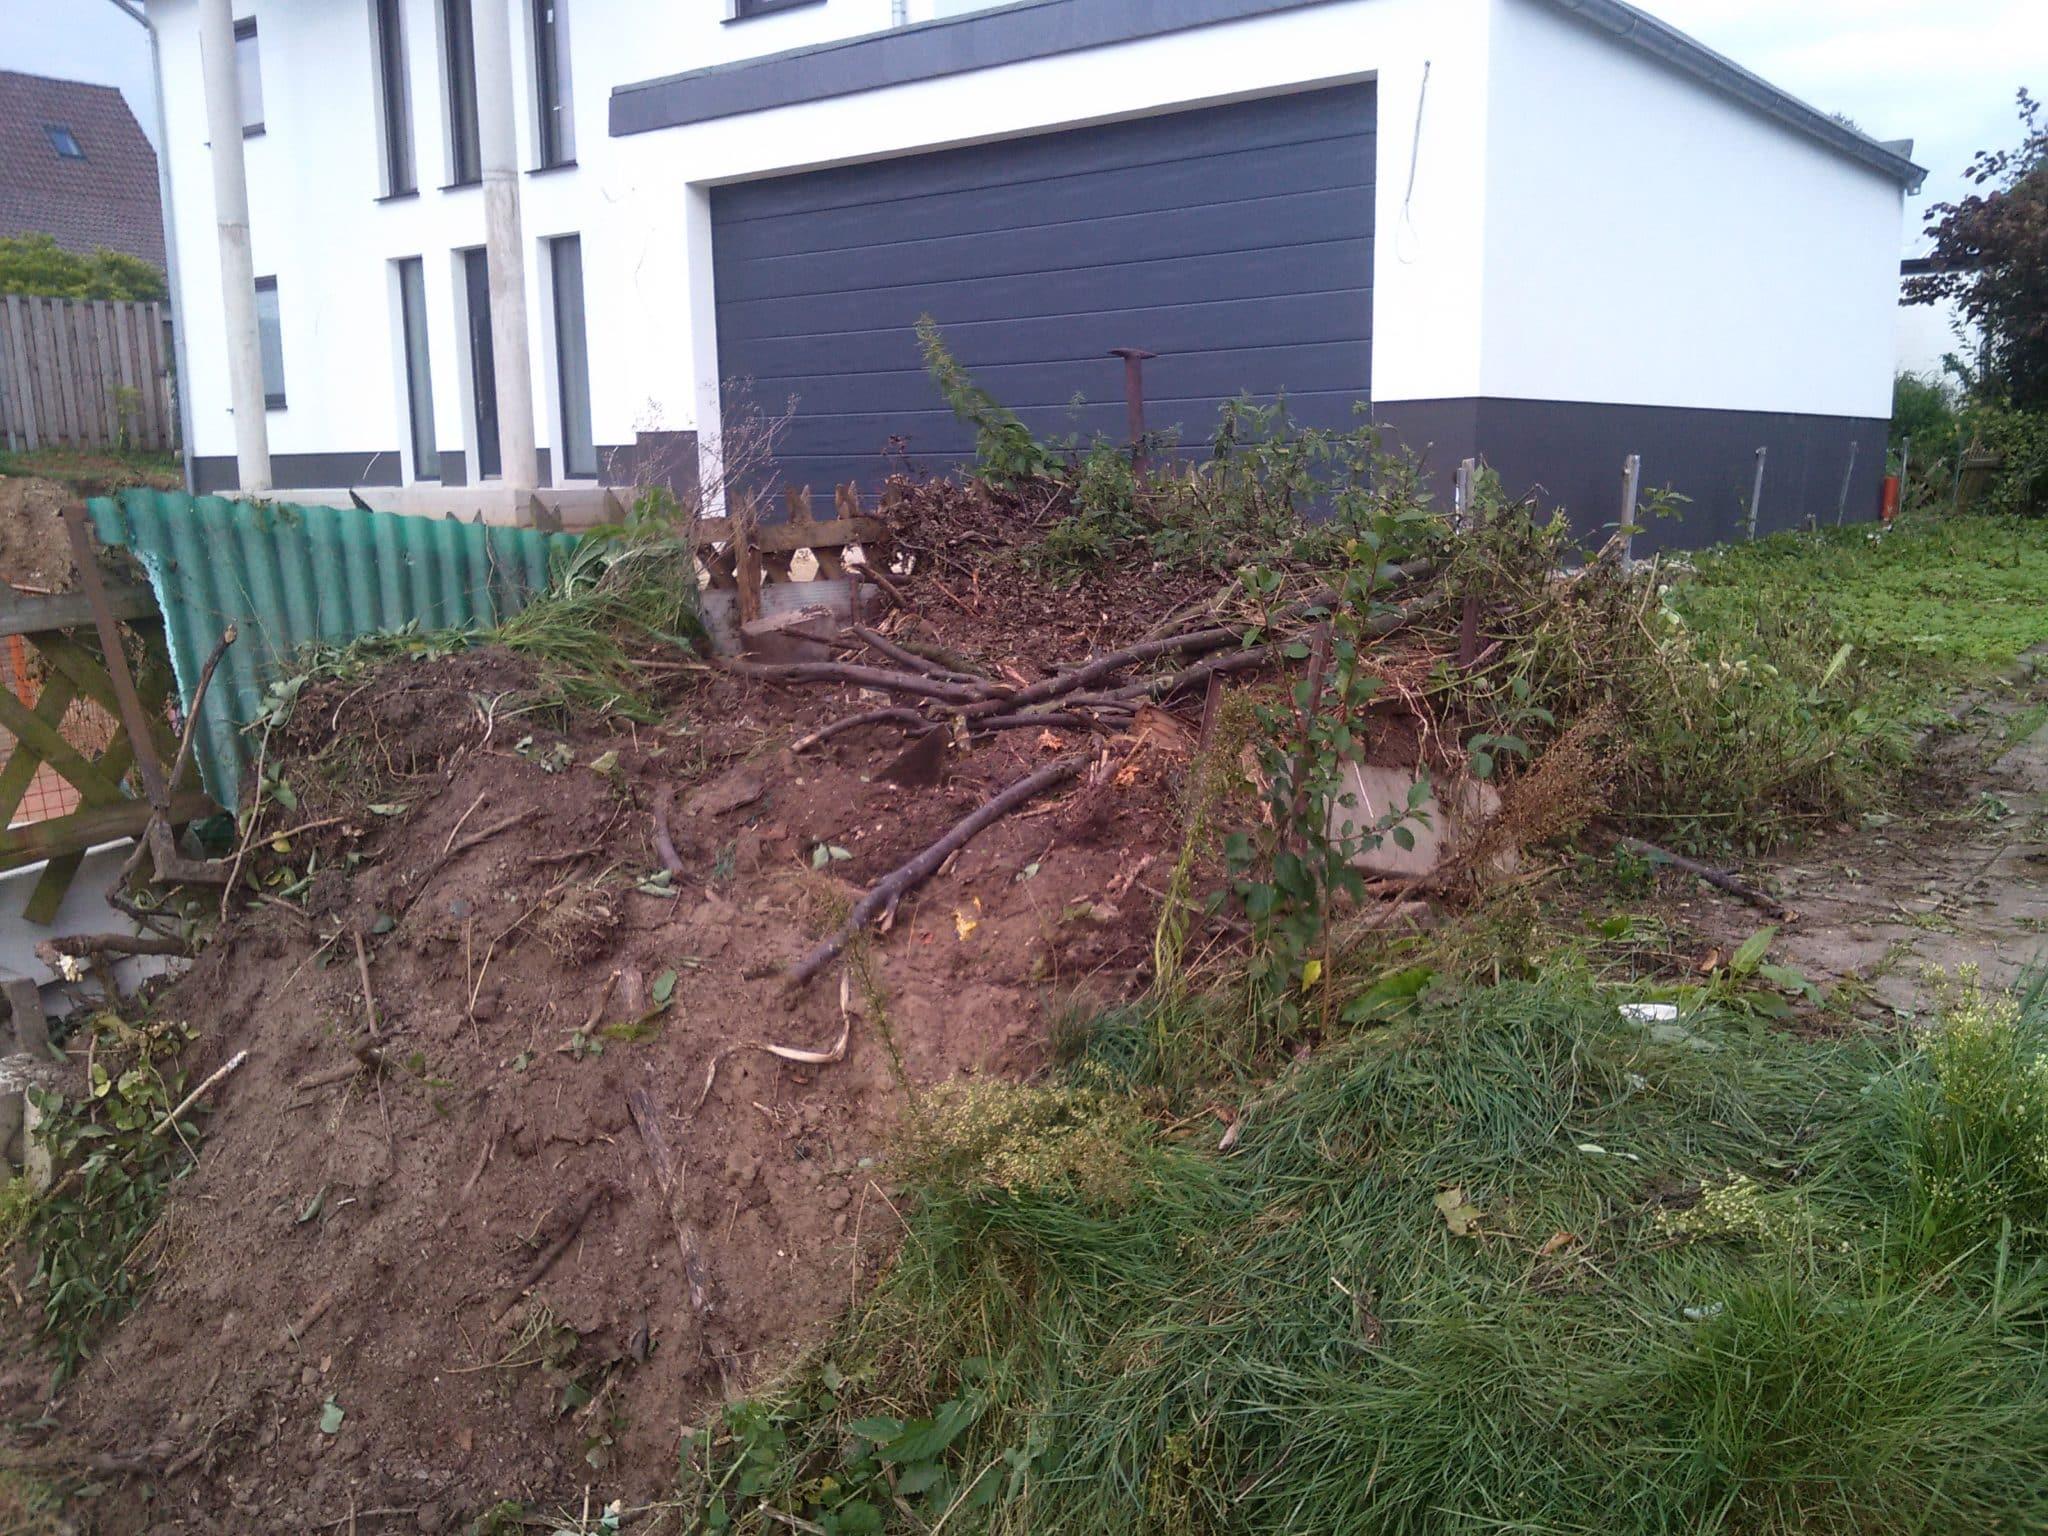 Entfernung Komposthaufen Bad Oeynhausen